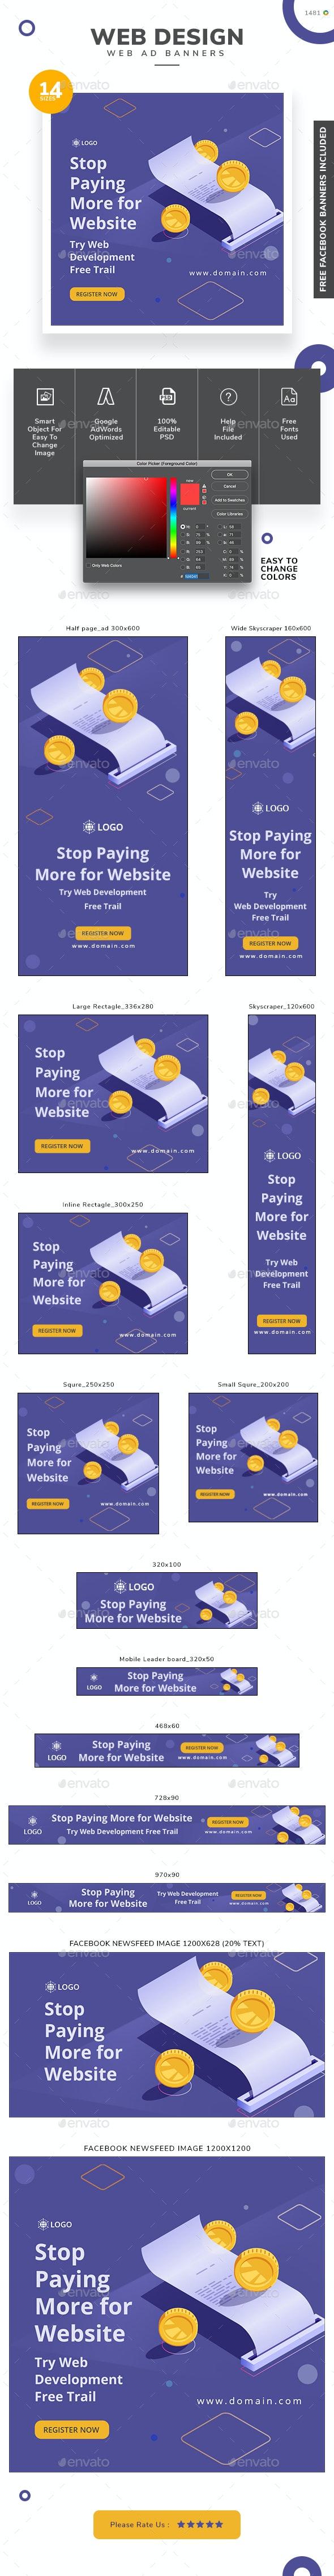 Web Design Banner Set - Banners & Ads Web Elements